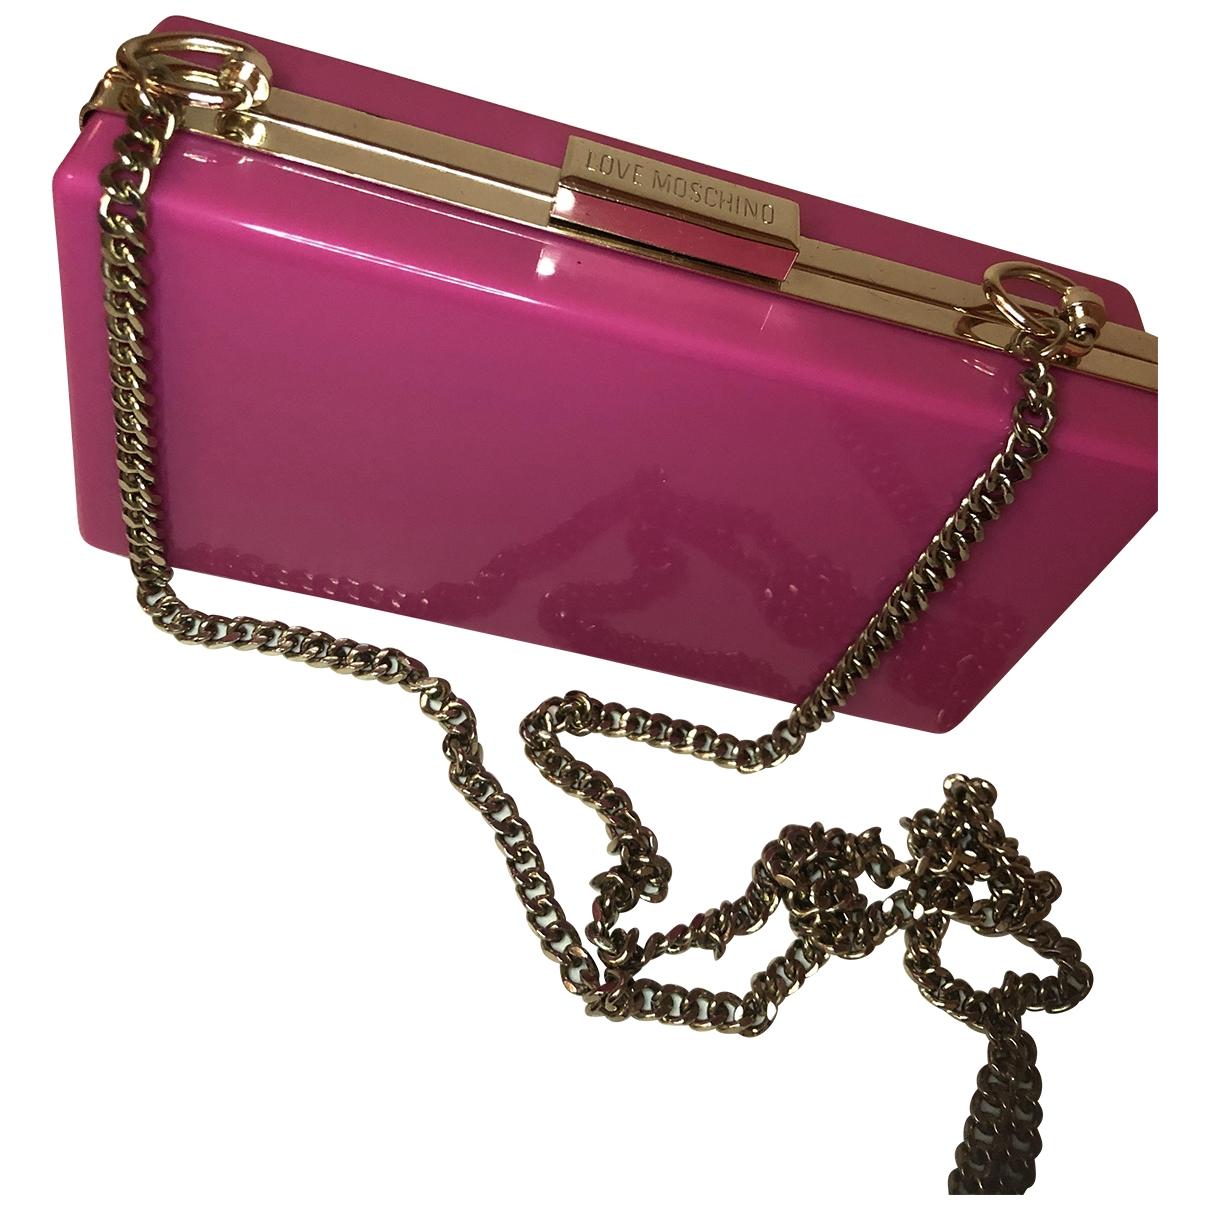 Moschino Love \N Pink Clutch bag for Women \N